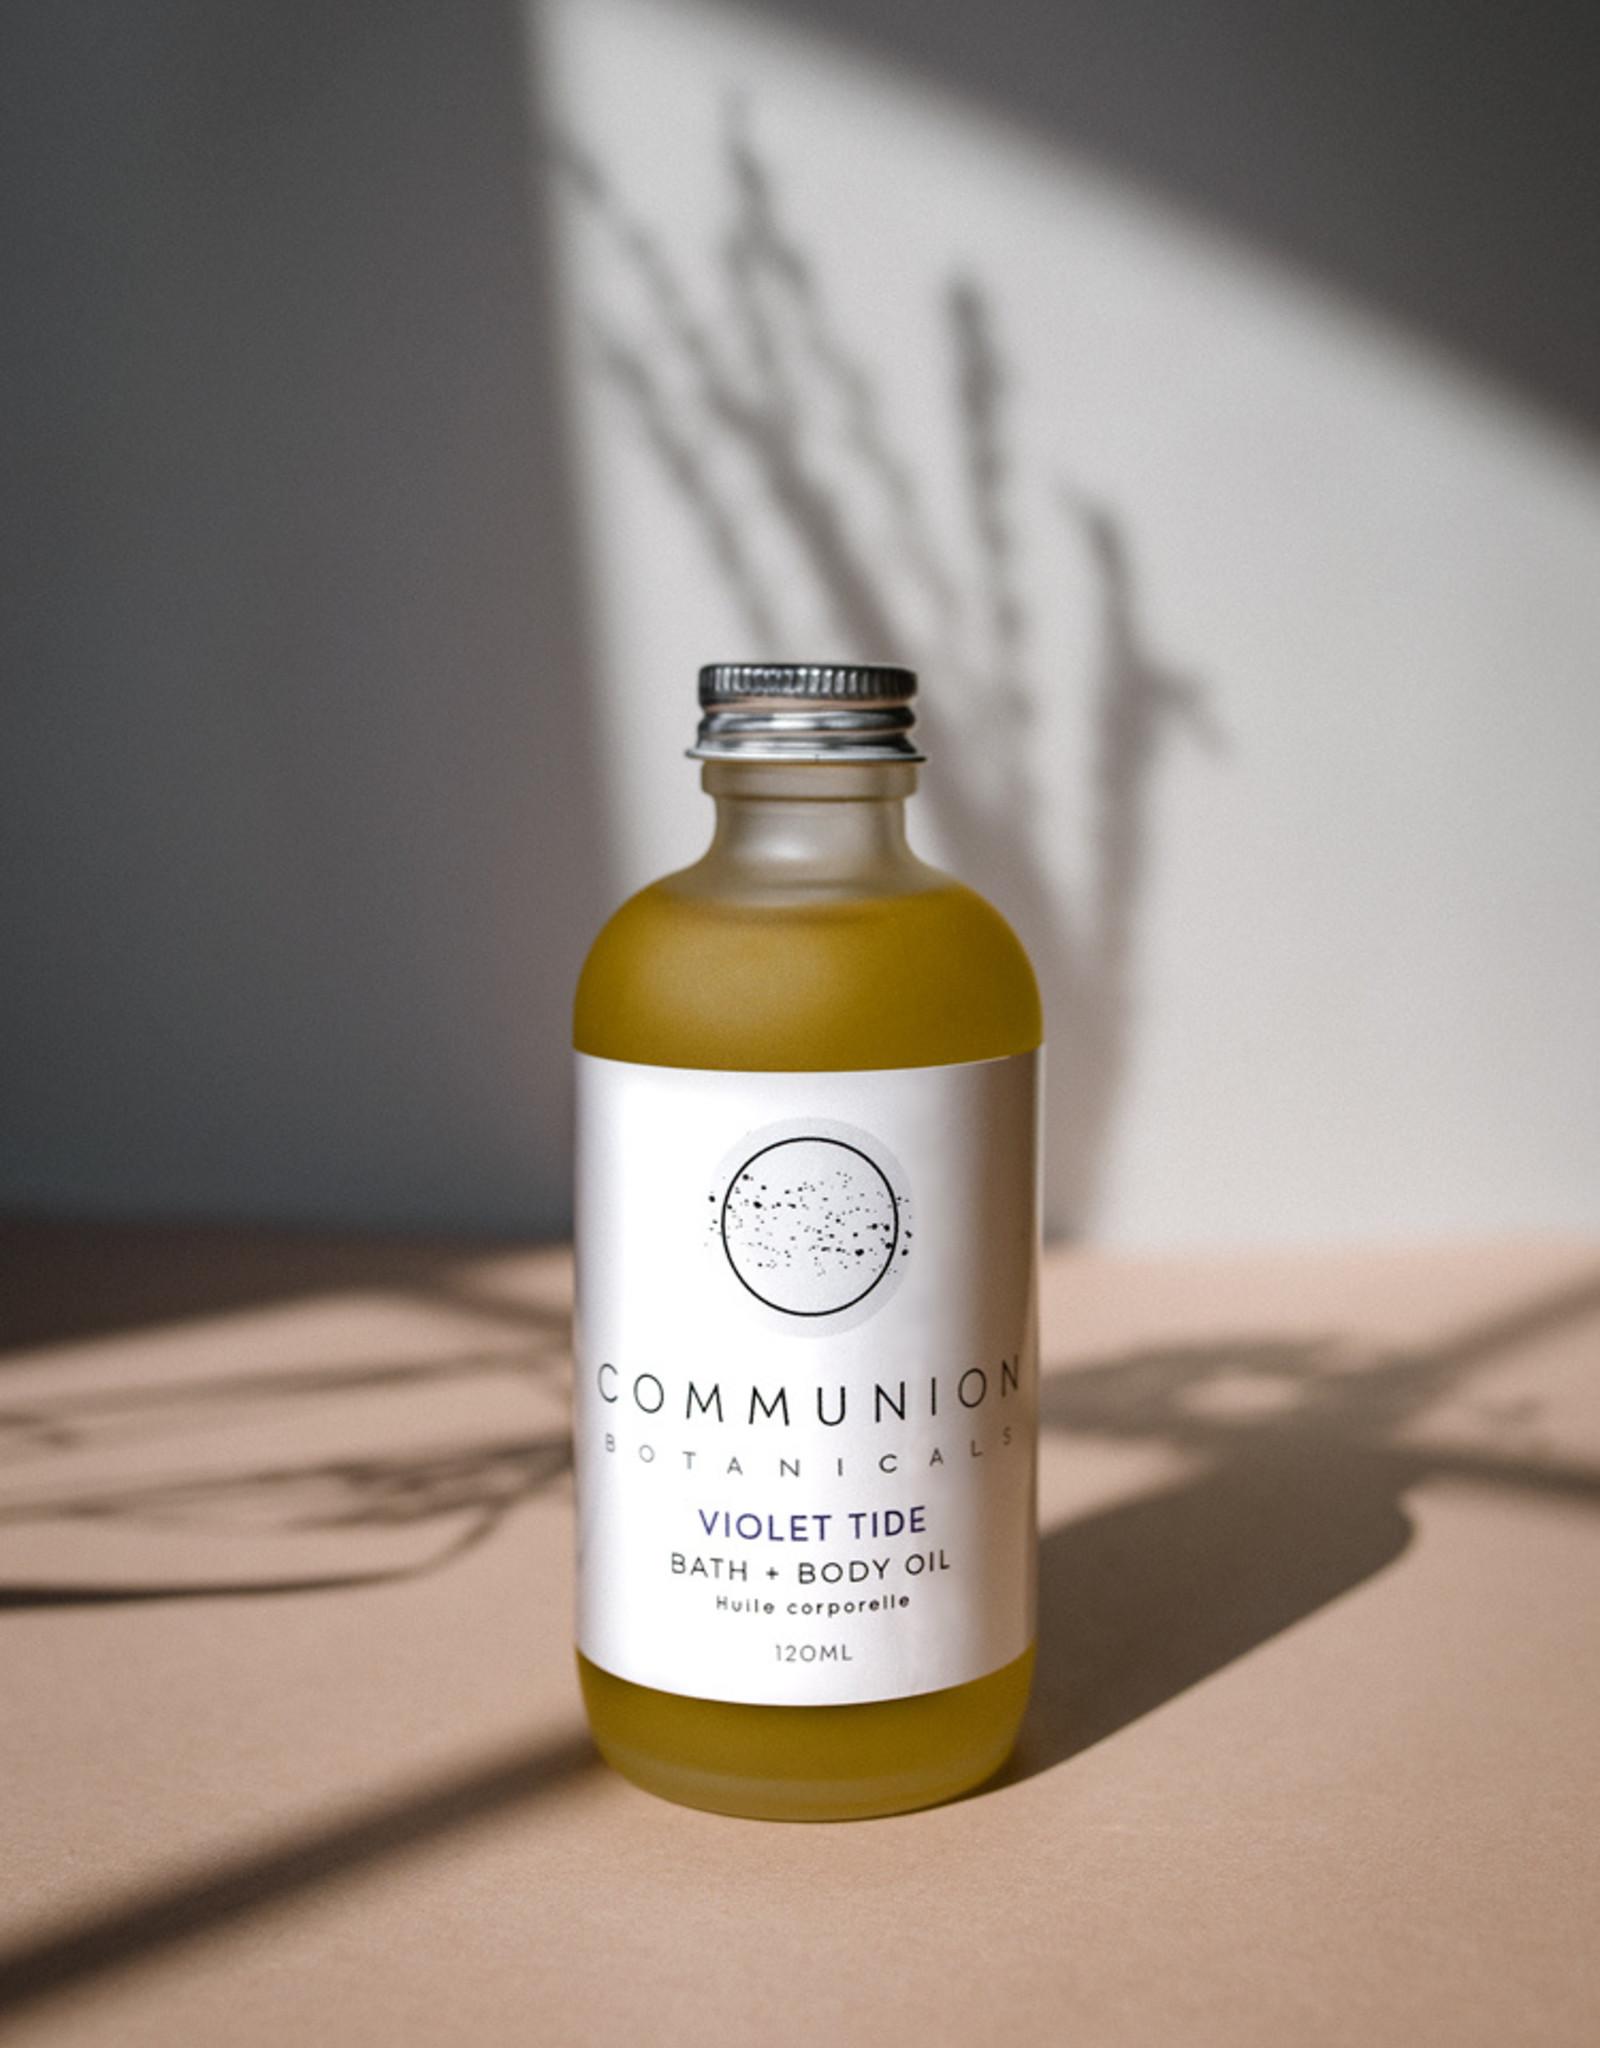 Communion Botanicals Violet Tide Bath & Body Oil